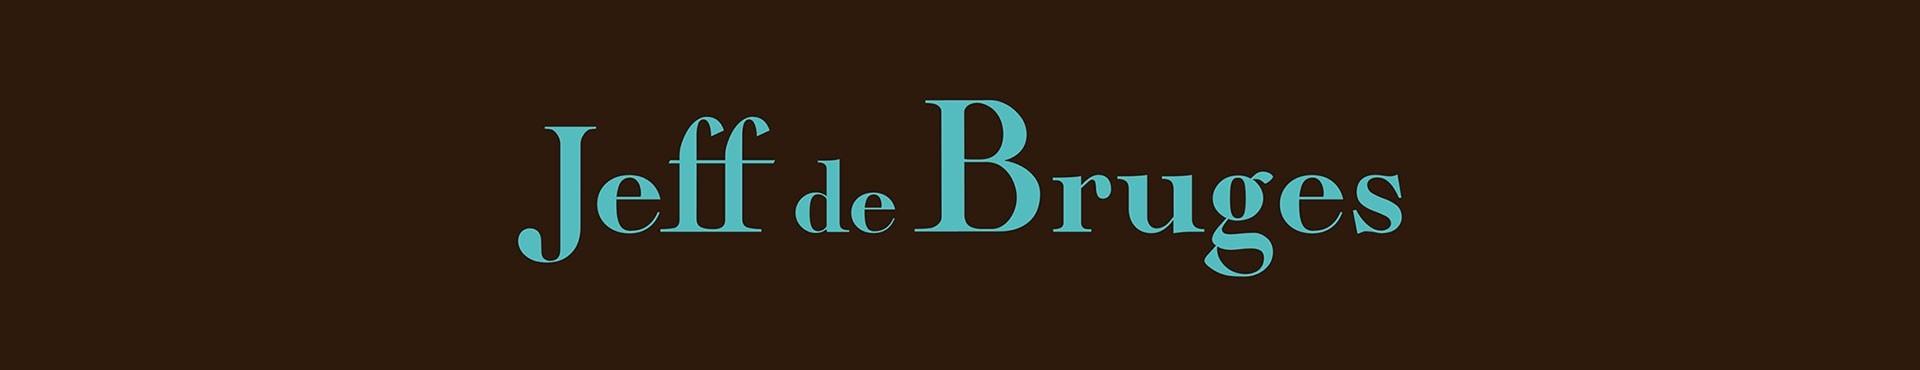 Nos chocolats Jeff de Bruges - OnWine